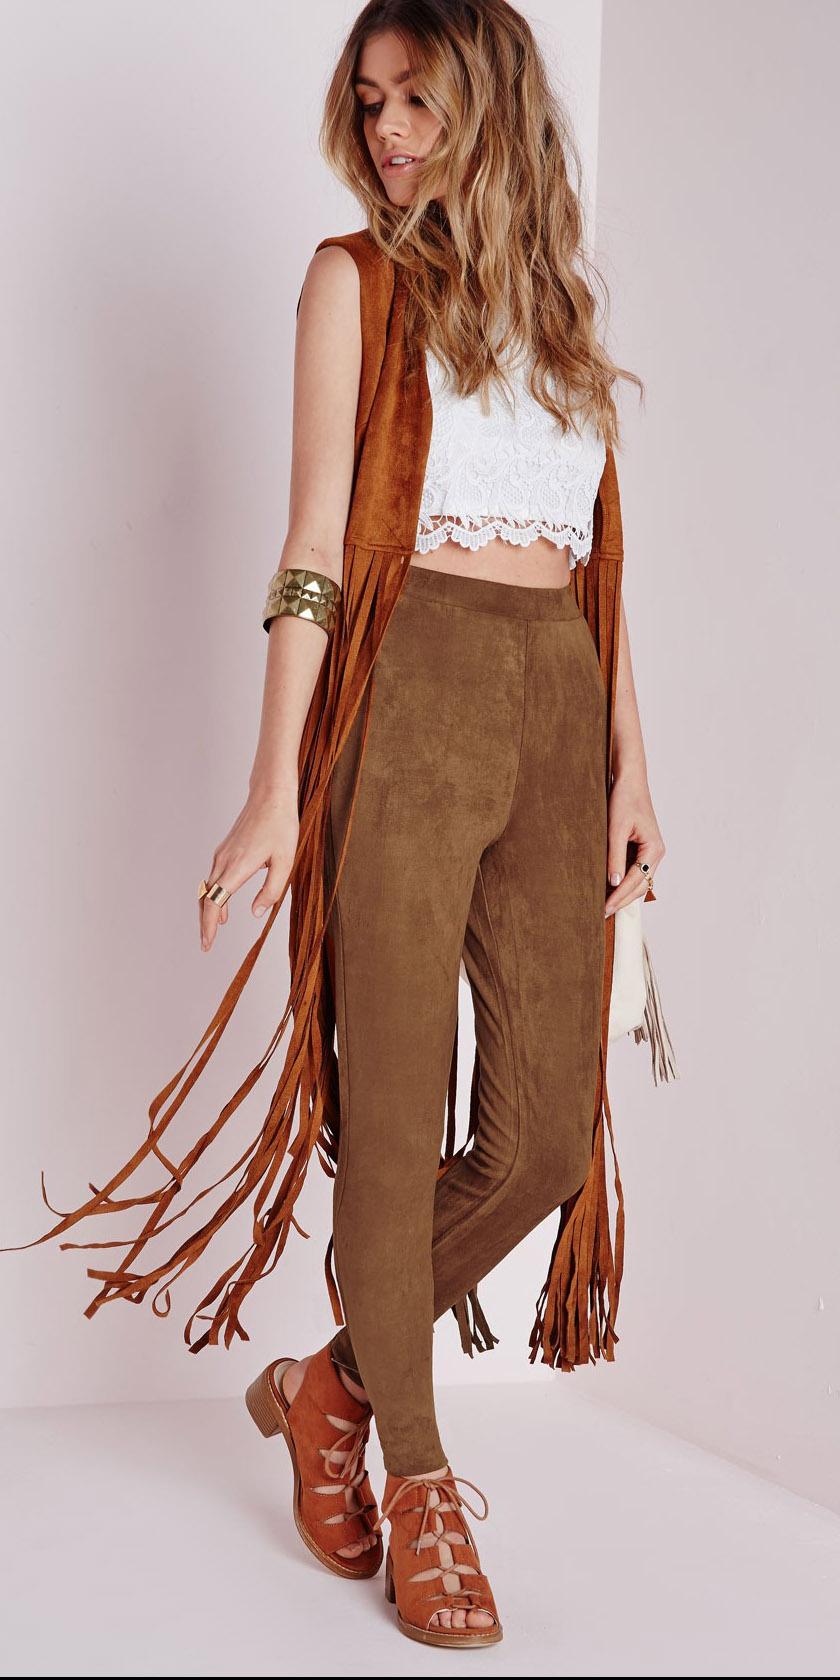 o-camel-joggers-pants-white-top-crop-camel-vest-cognac-shoe-sandalh-bracelet-suede-howtowear-fashion-style-outfit-spring-summer-hairr-weekend.jpg